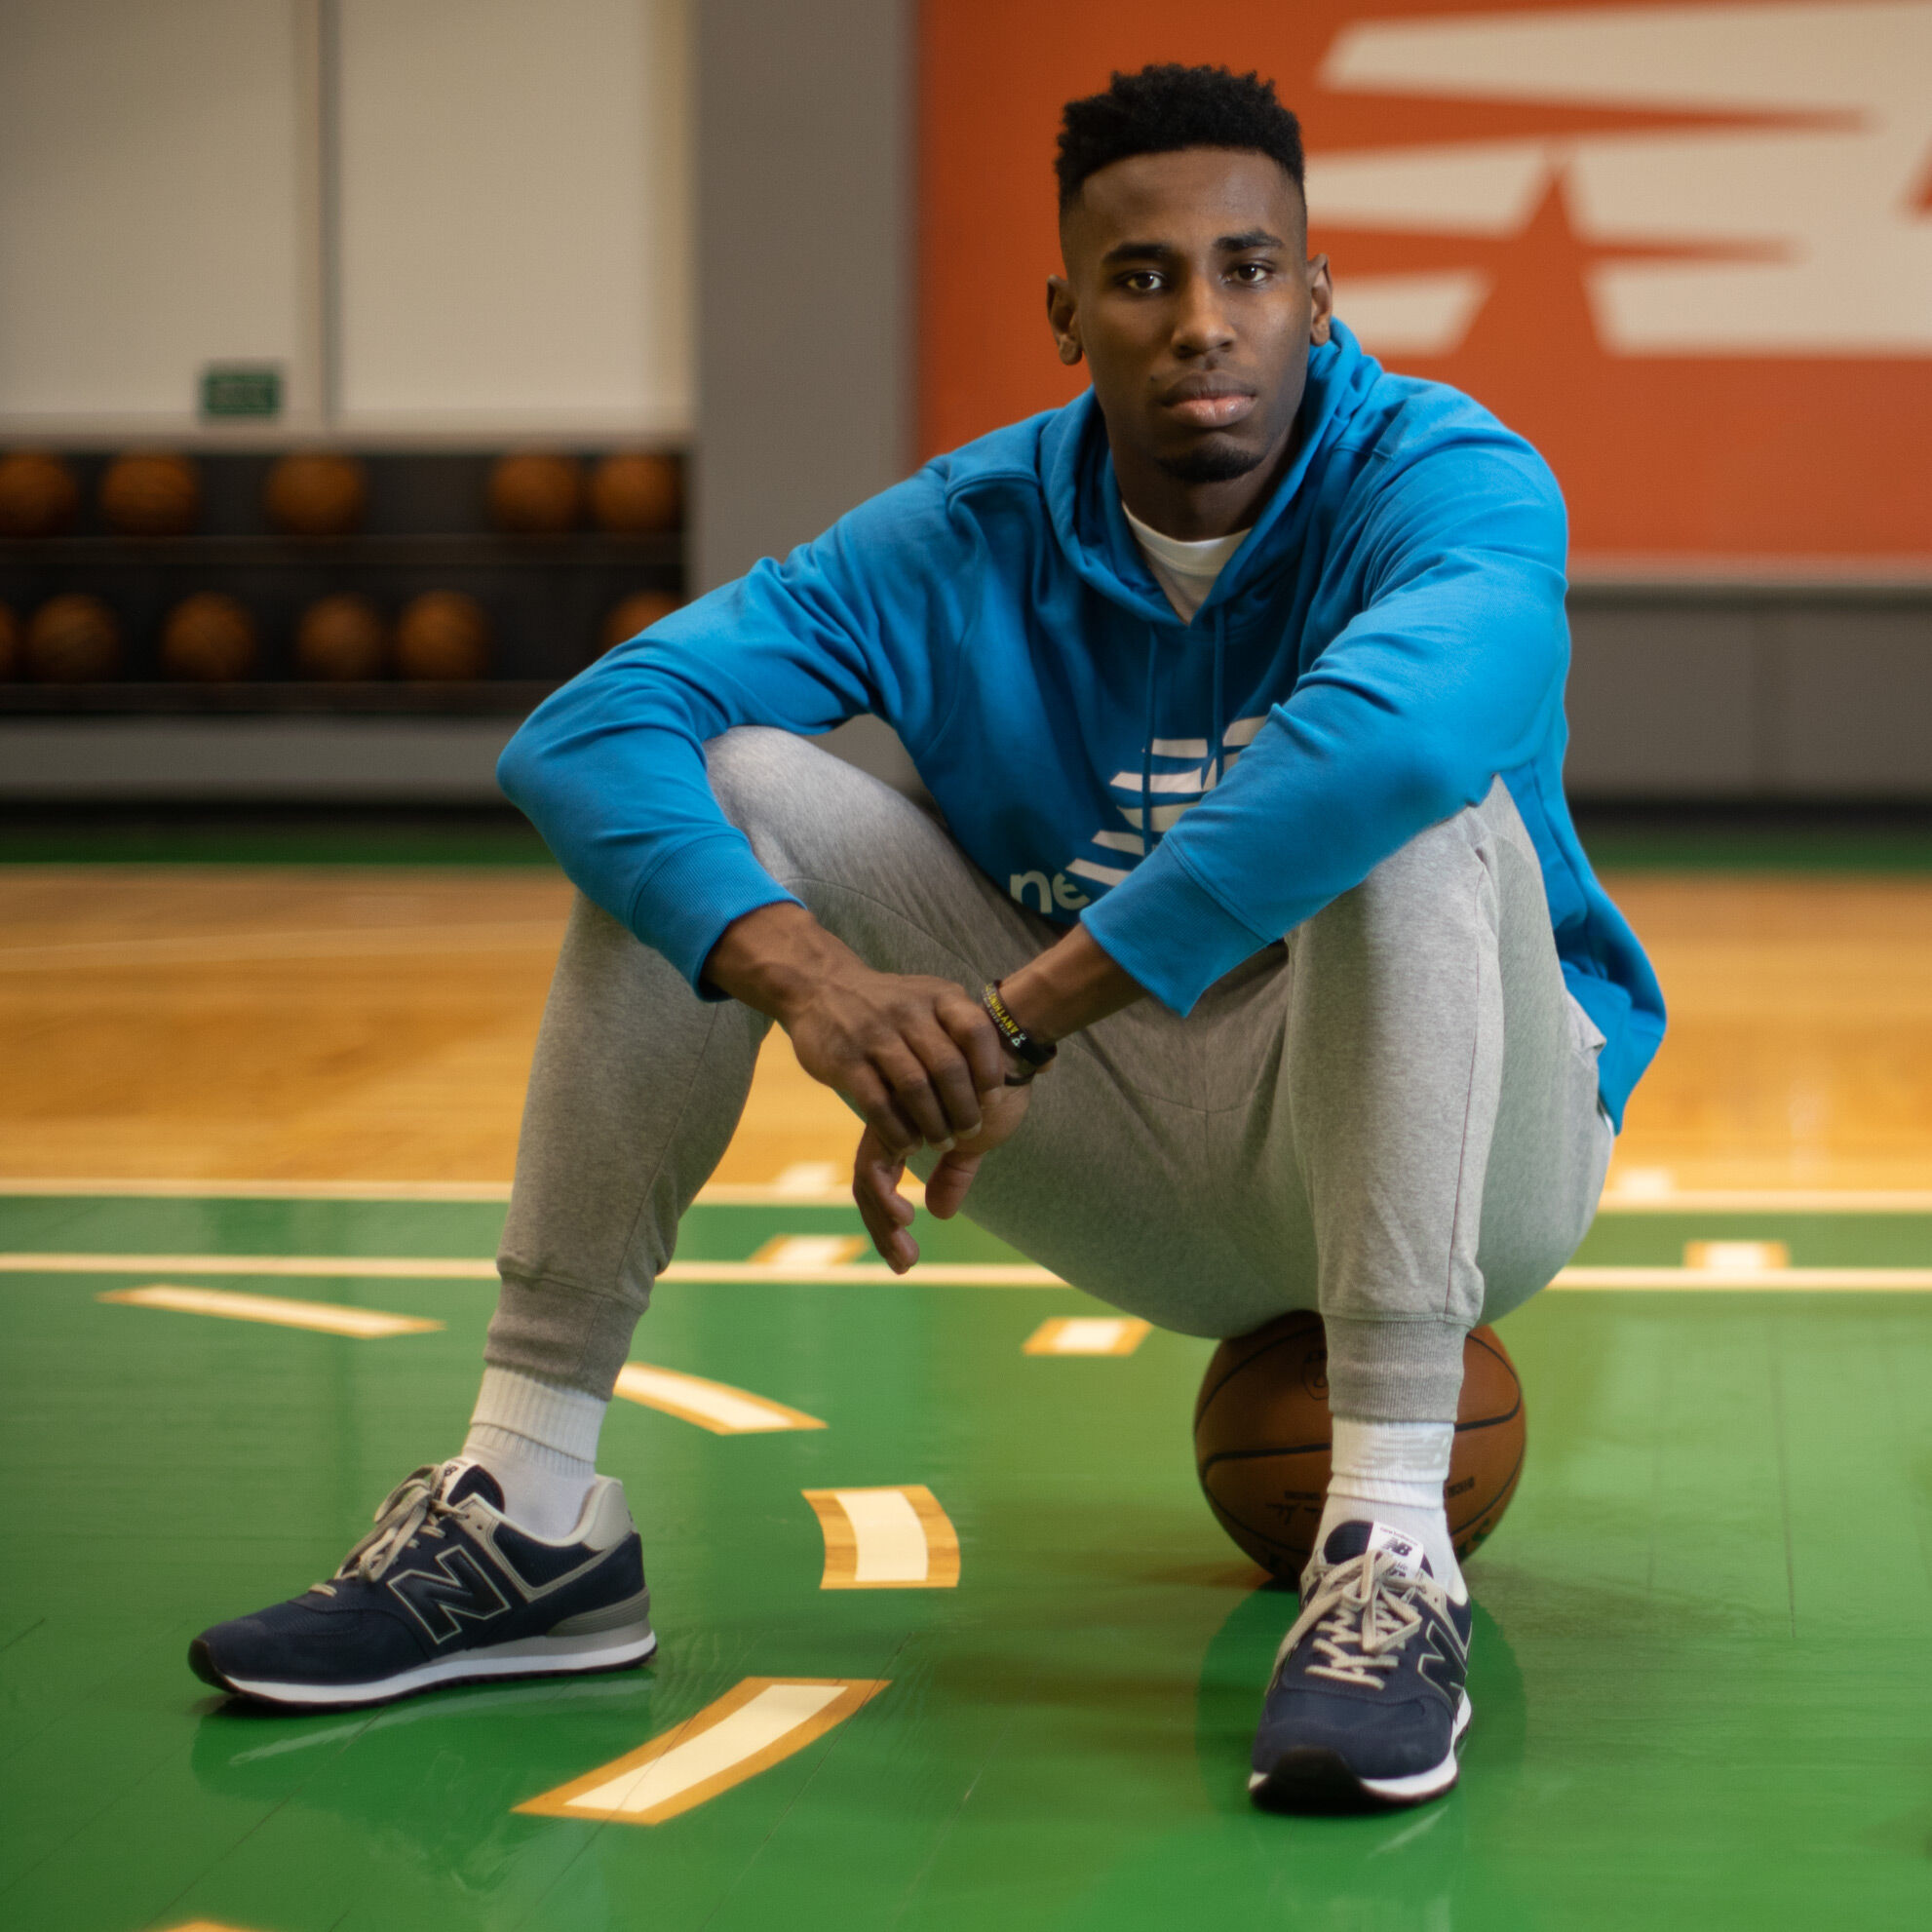 Basketball Scarpe e Vestiti - New Balance